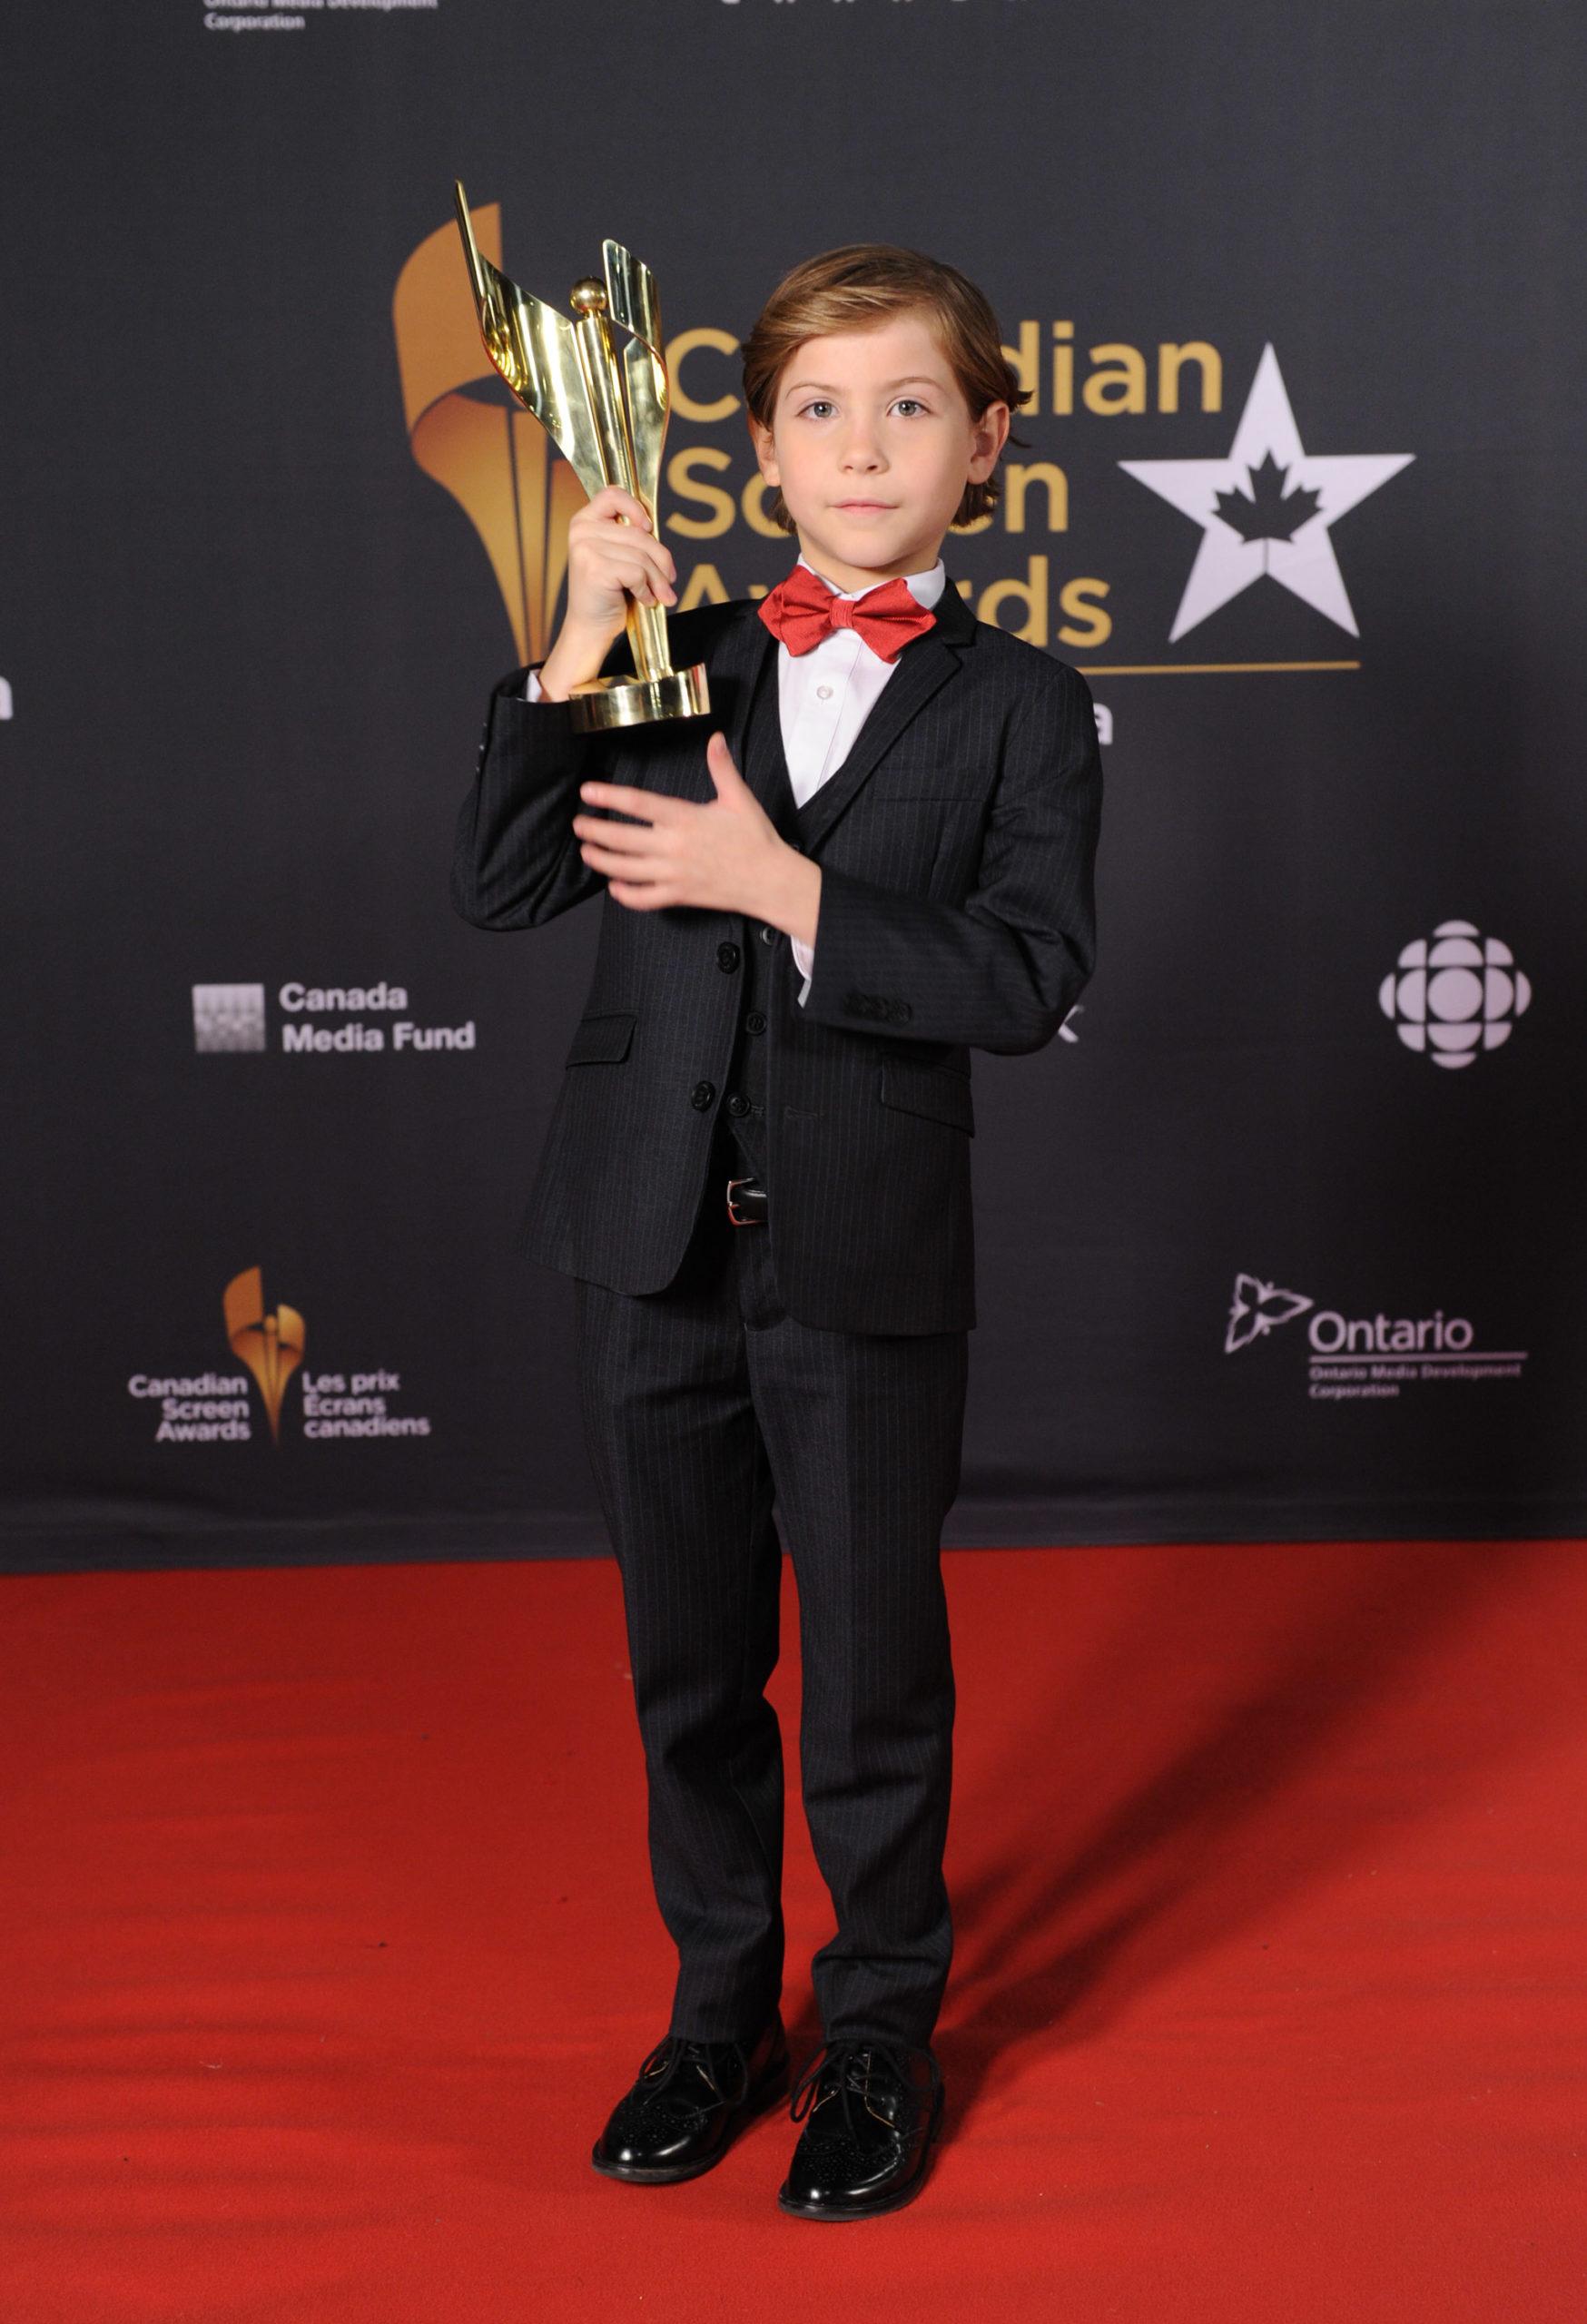 LiVECAST.ca - Canadian Screen Awards - Press Room